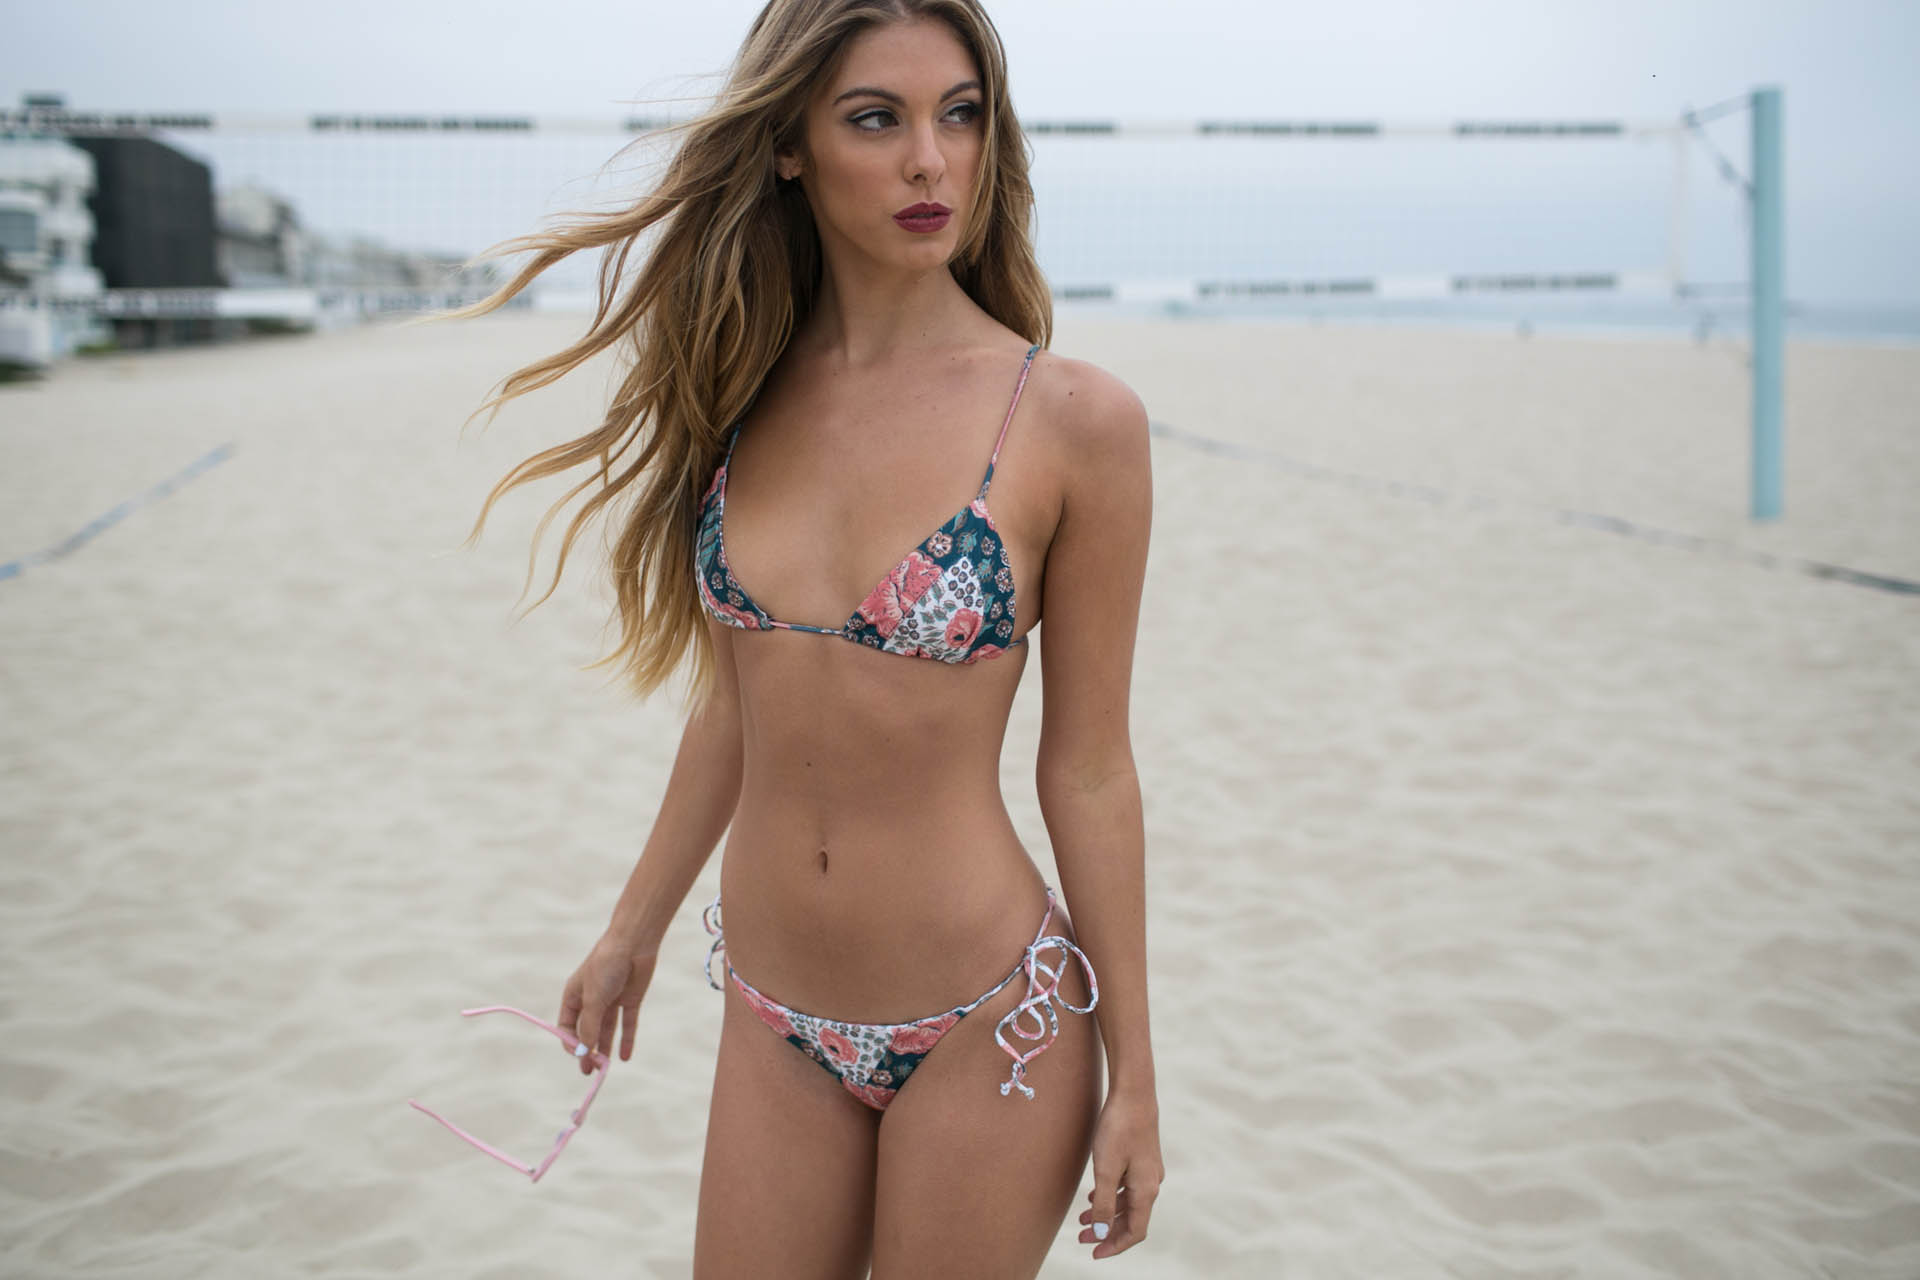 Carmella Rose on the beach. Девушка в бикини